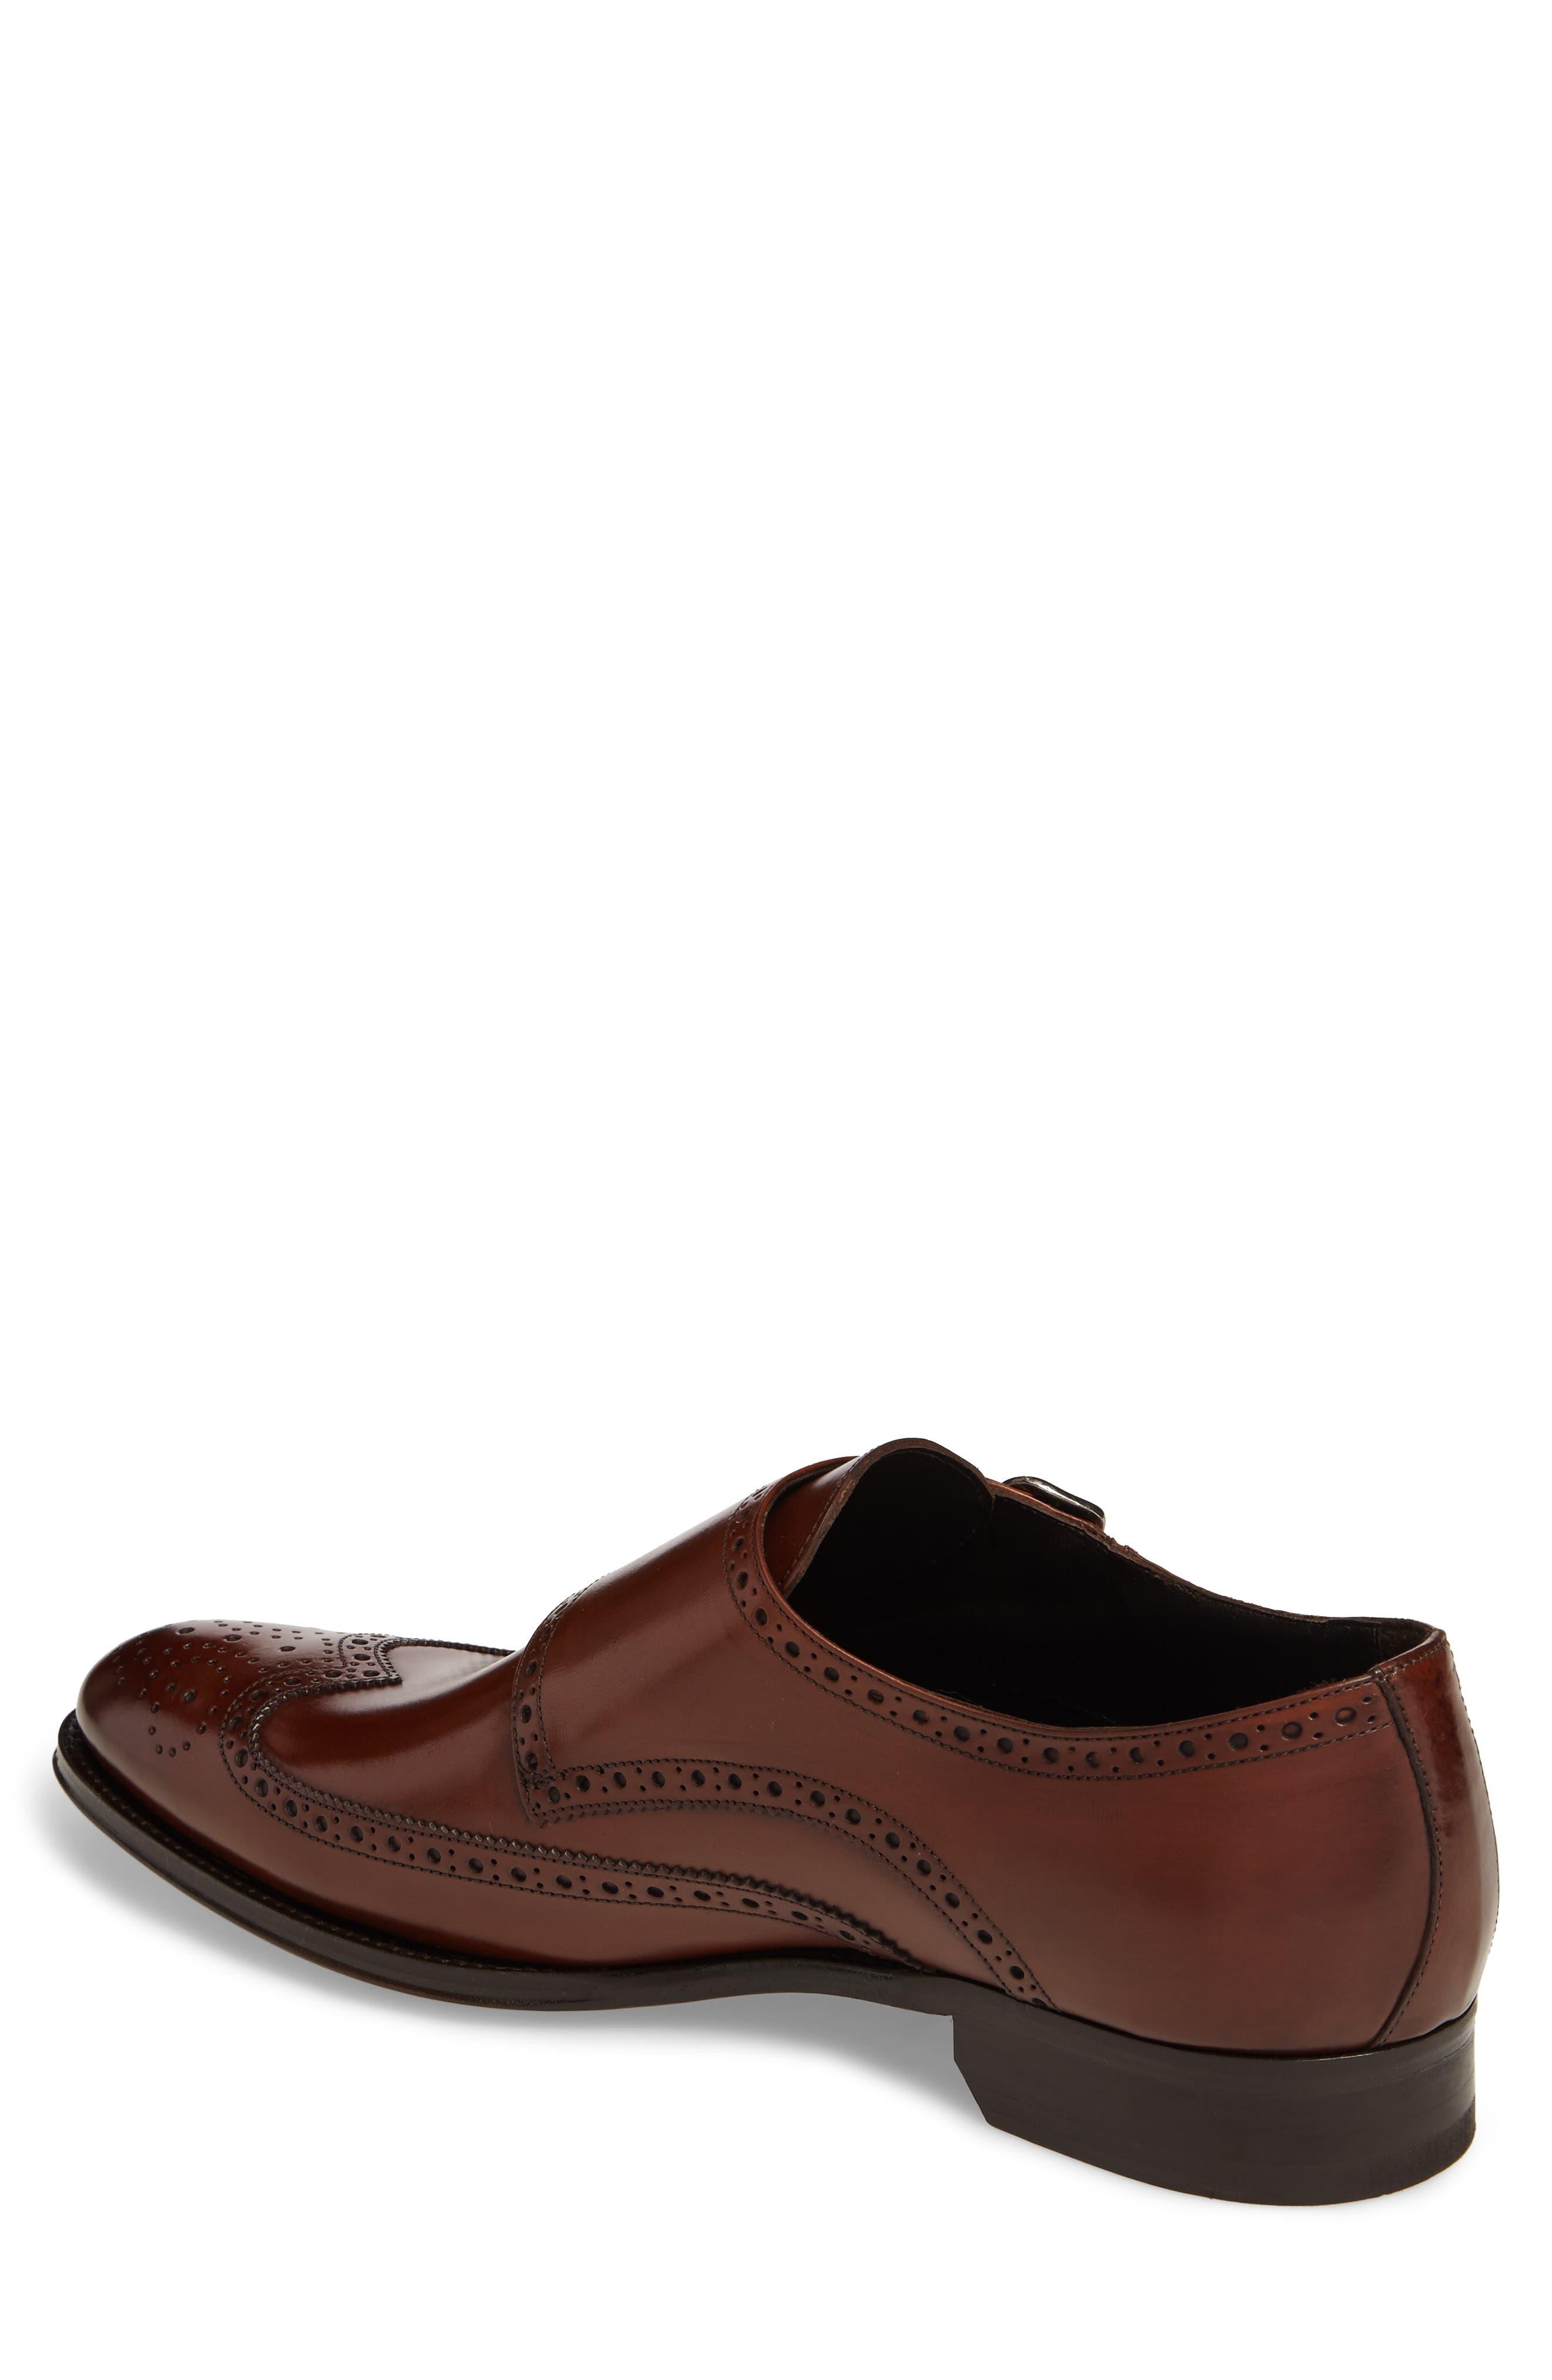 Pike Double Monk Strap Shoe,                             Alternate thumbnail 2, color,